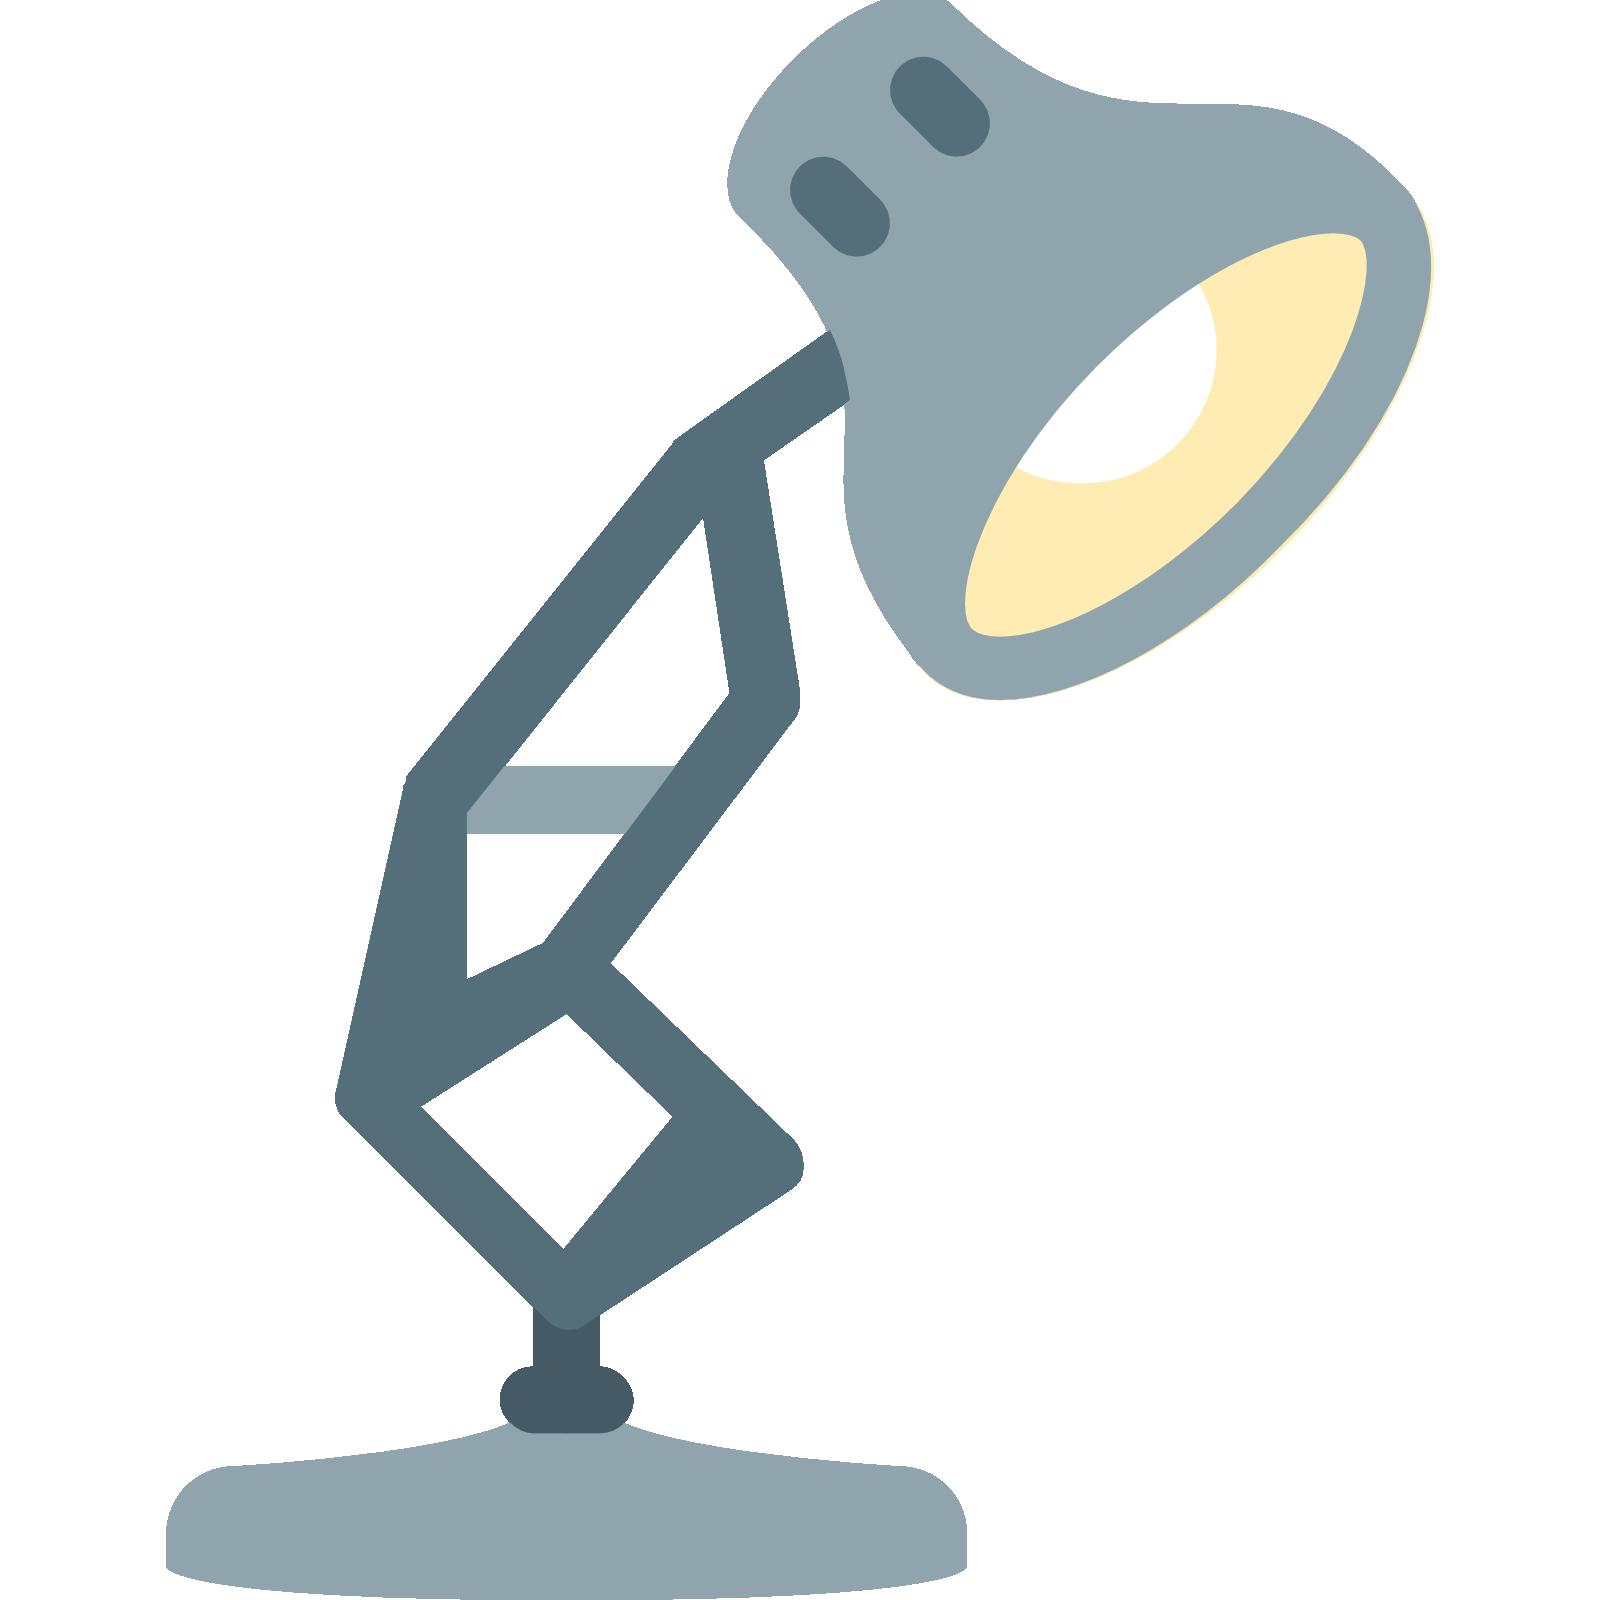 Drawn bulb pixar lamp 2 Icon Icon Lamp Icons8